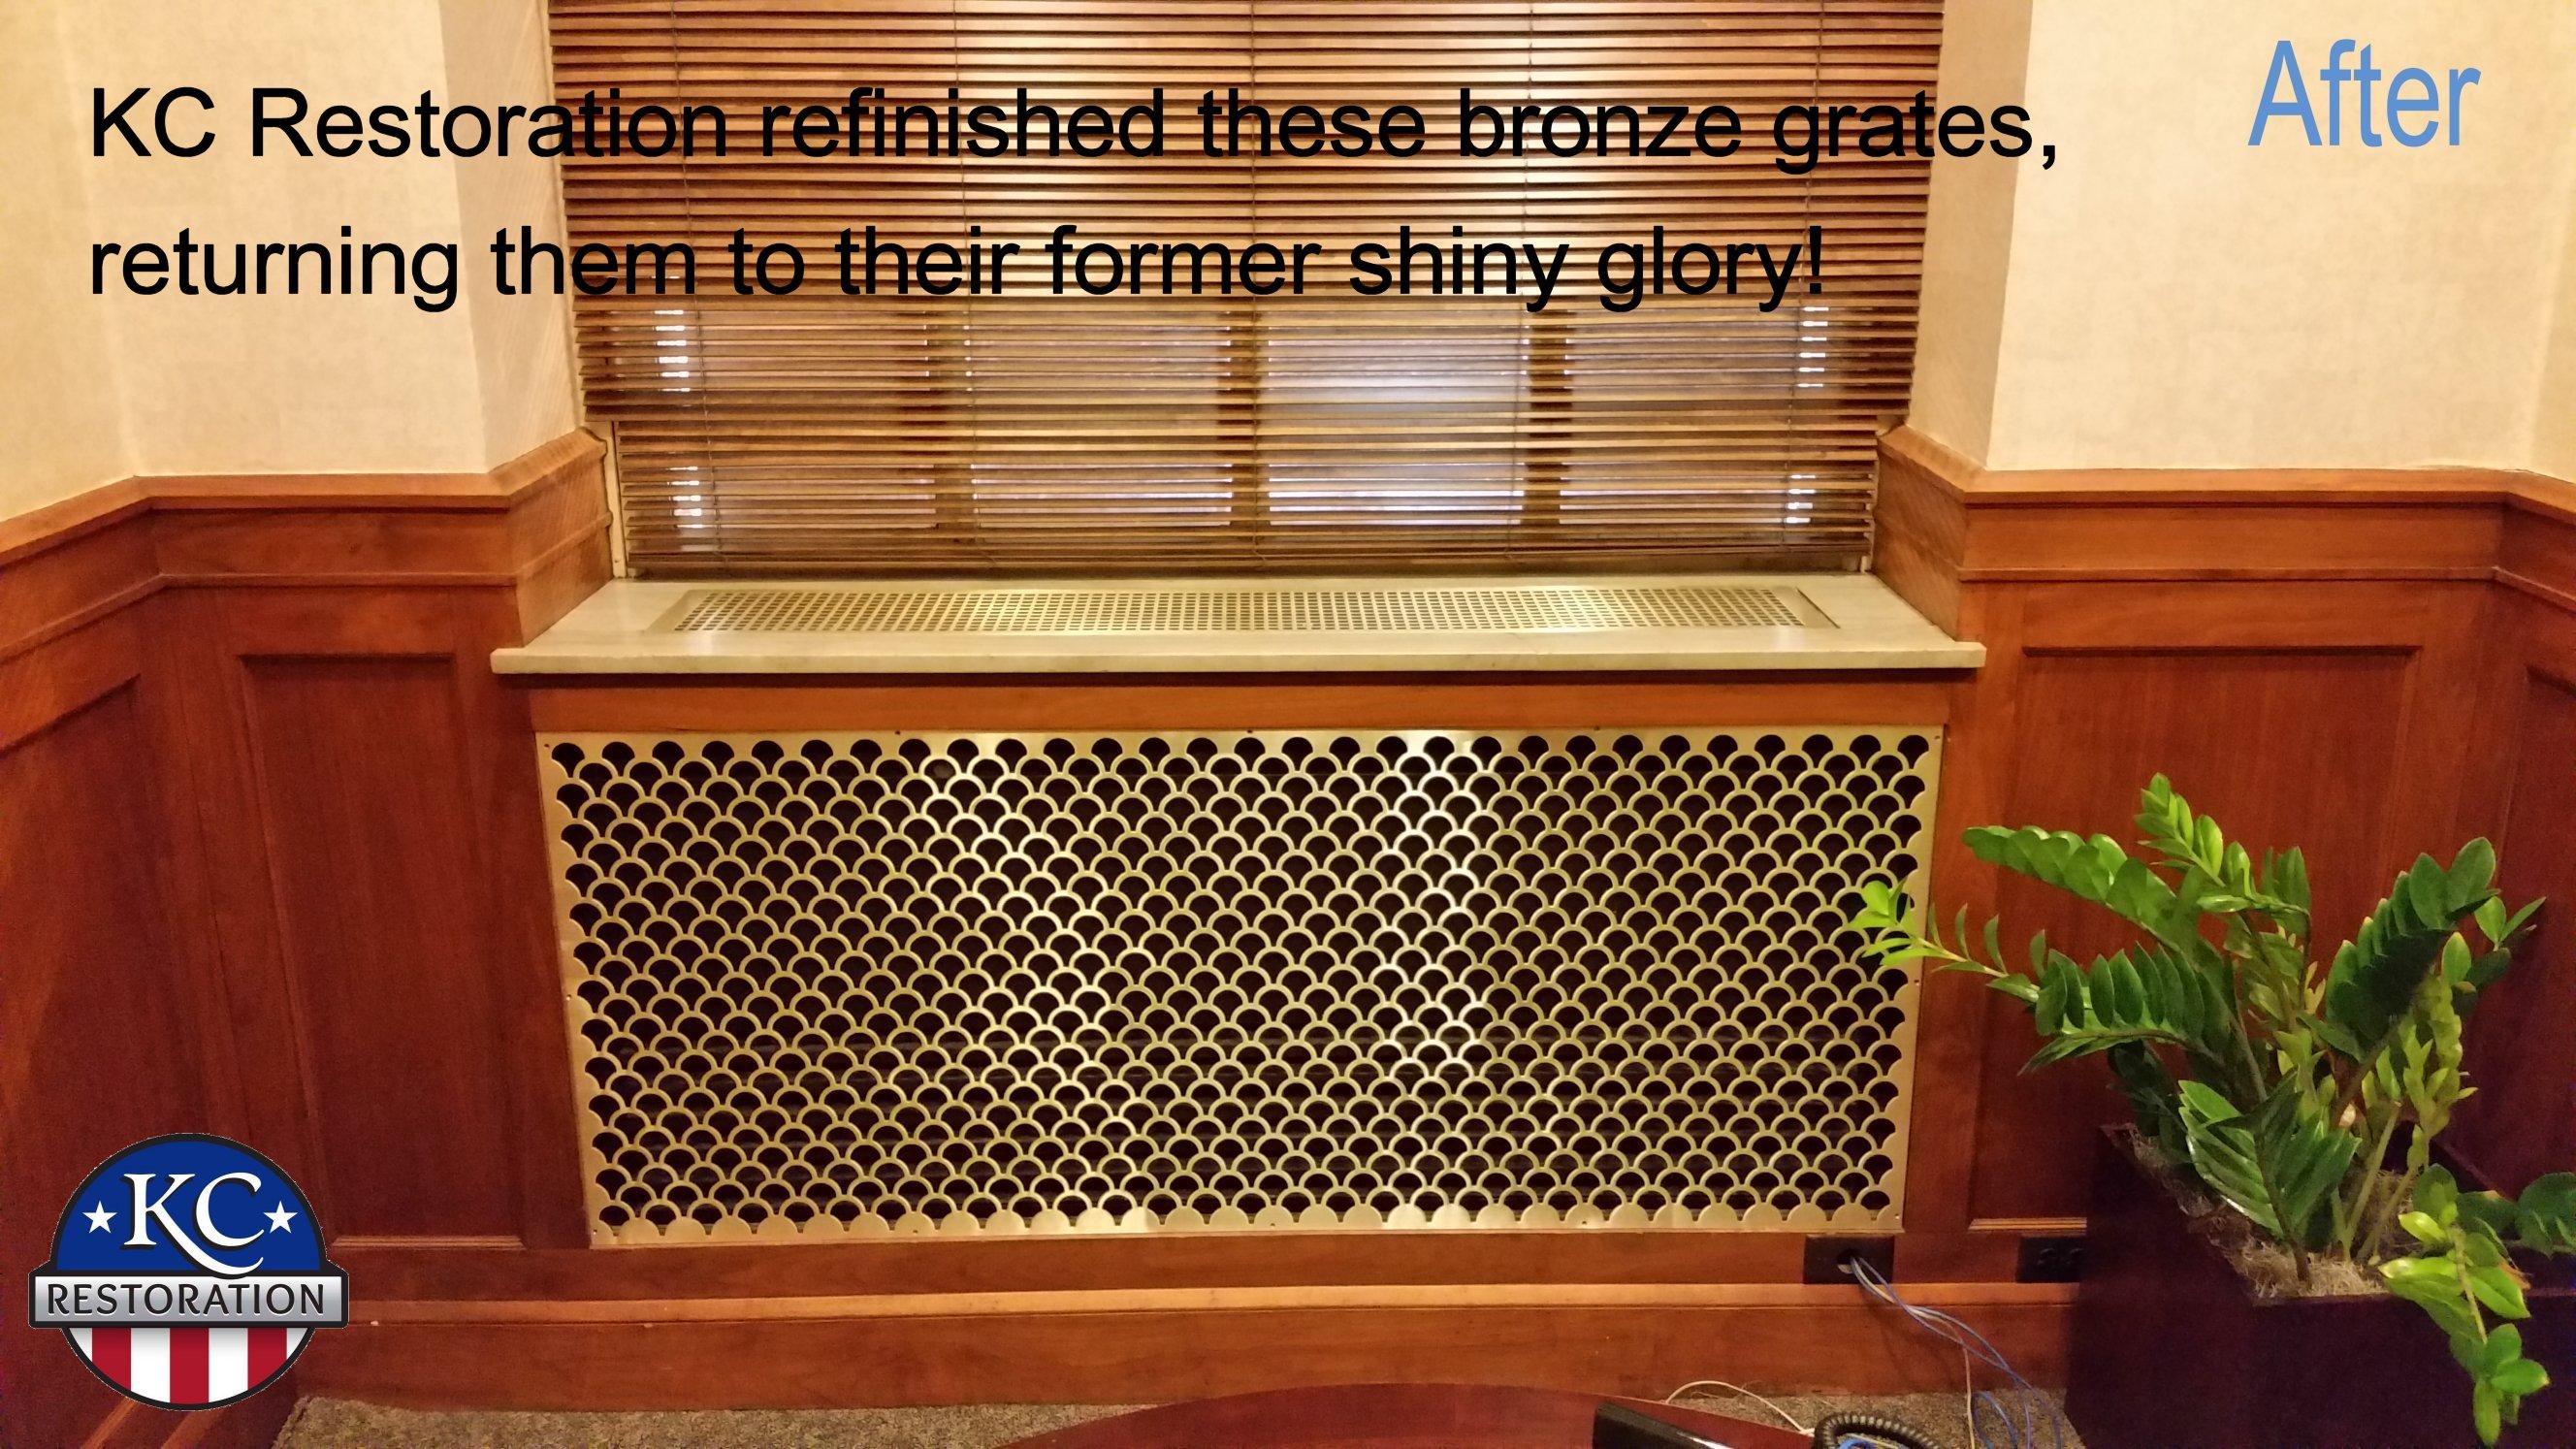 Grate restoration